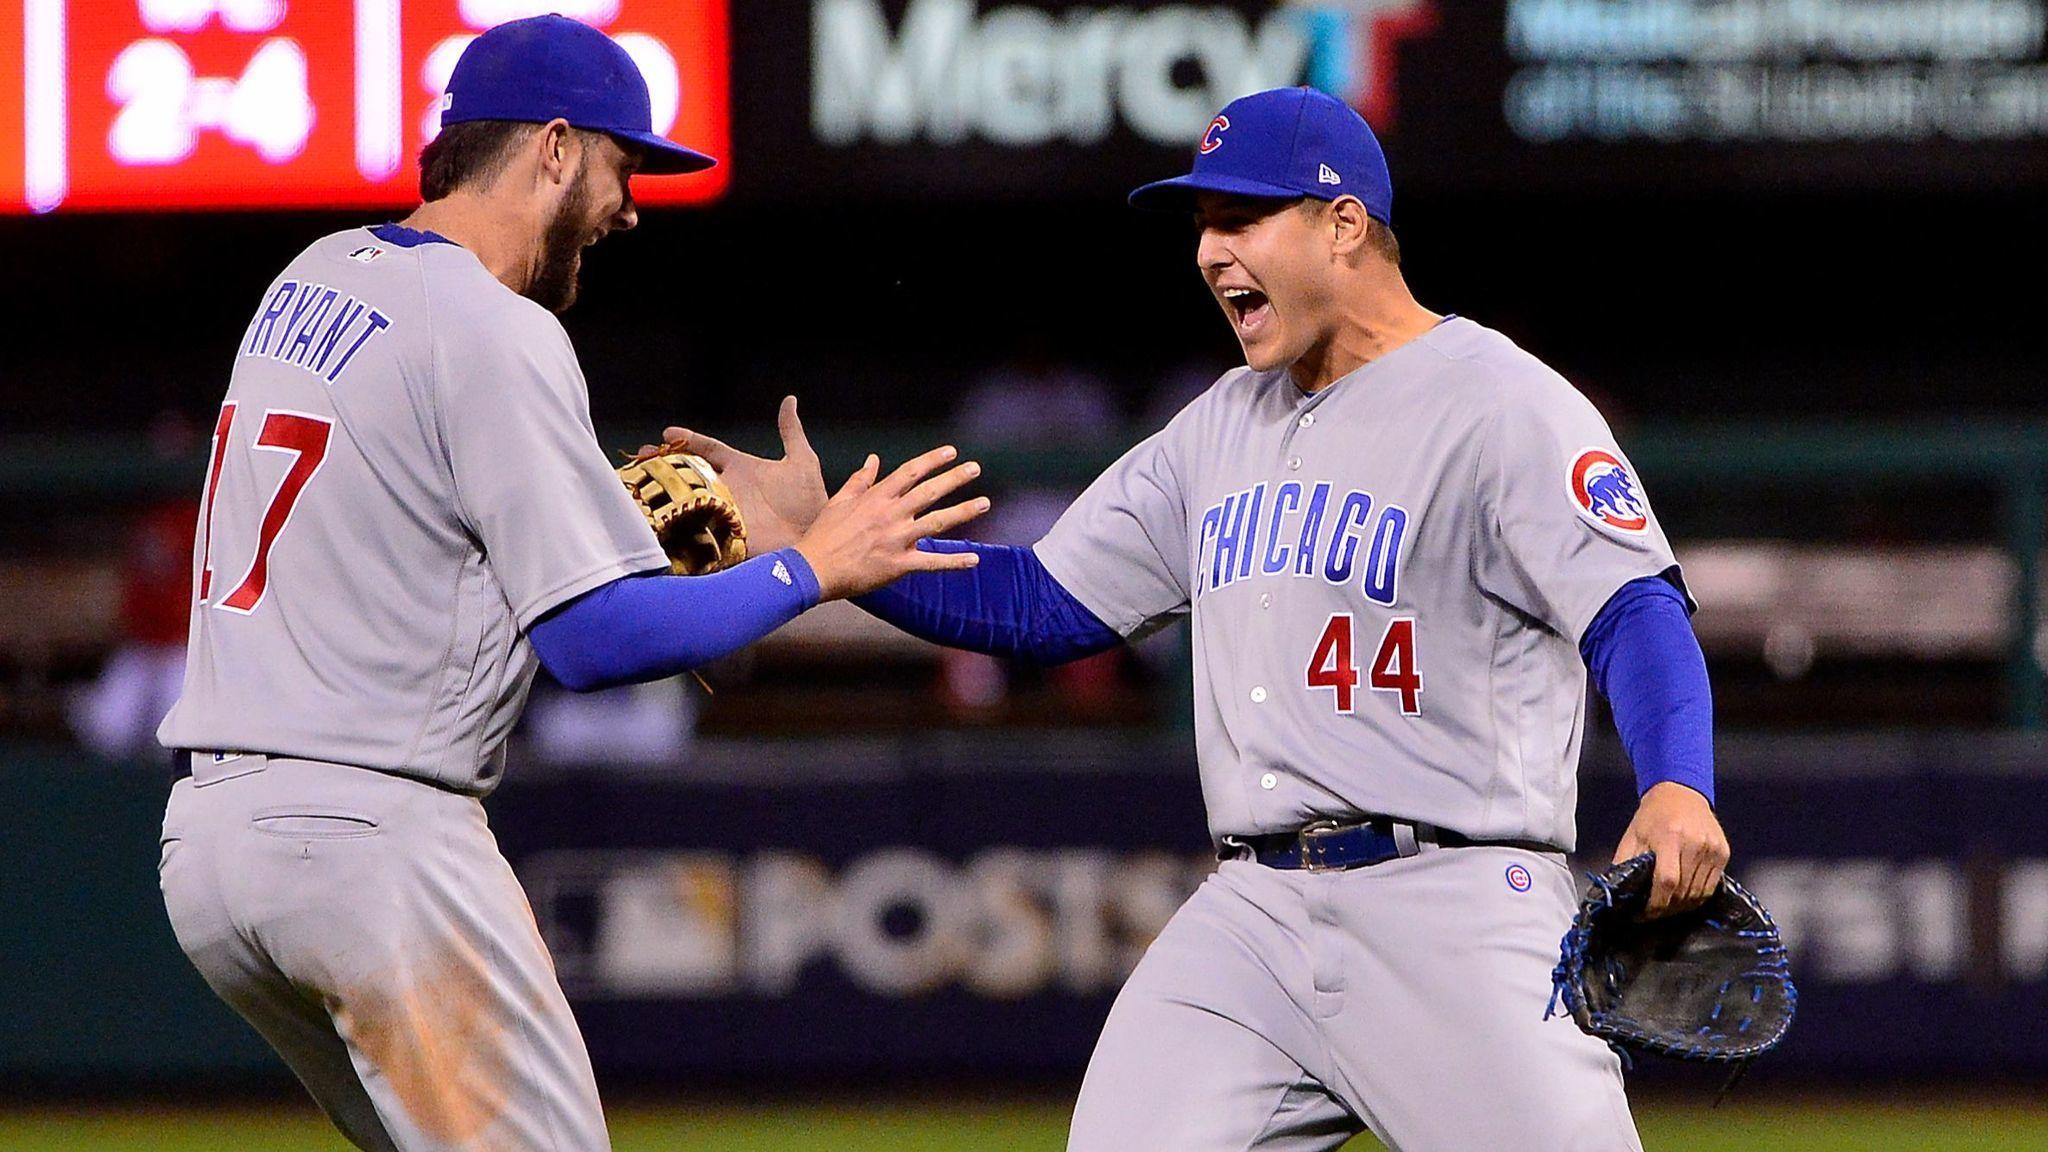 NLDS at a glance  Cubs vs. Nationals - The San Diego Union-Tribune 0a563c5e70e